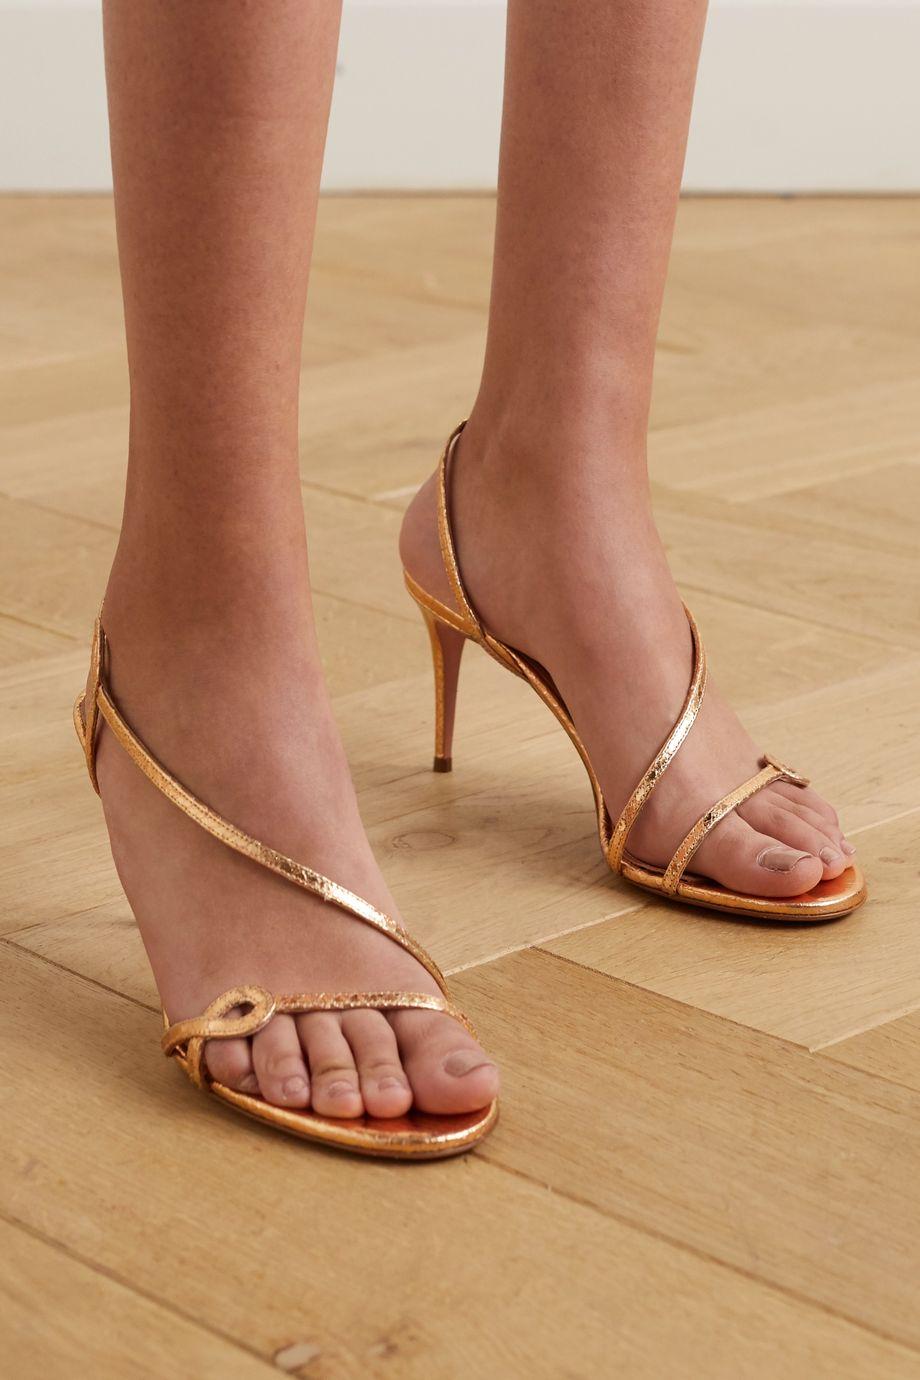 Aquazzura Serpentine 75 metallic snake-effect leather slingback sandals